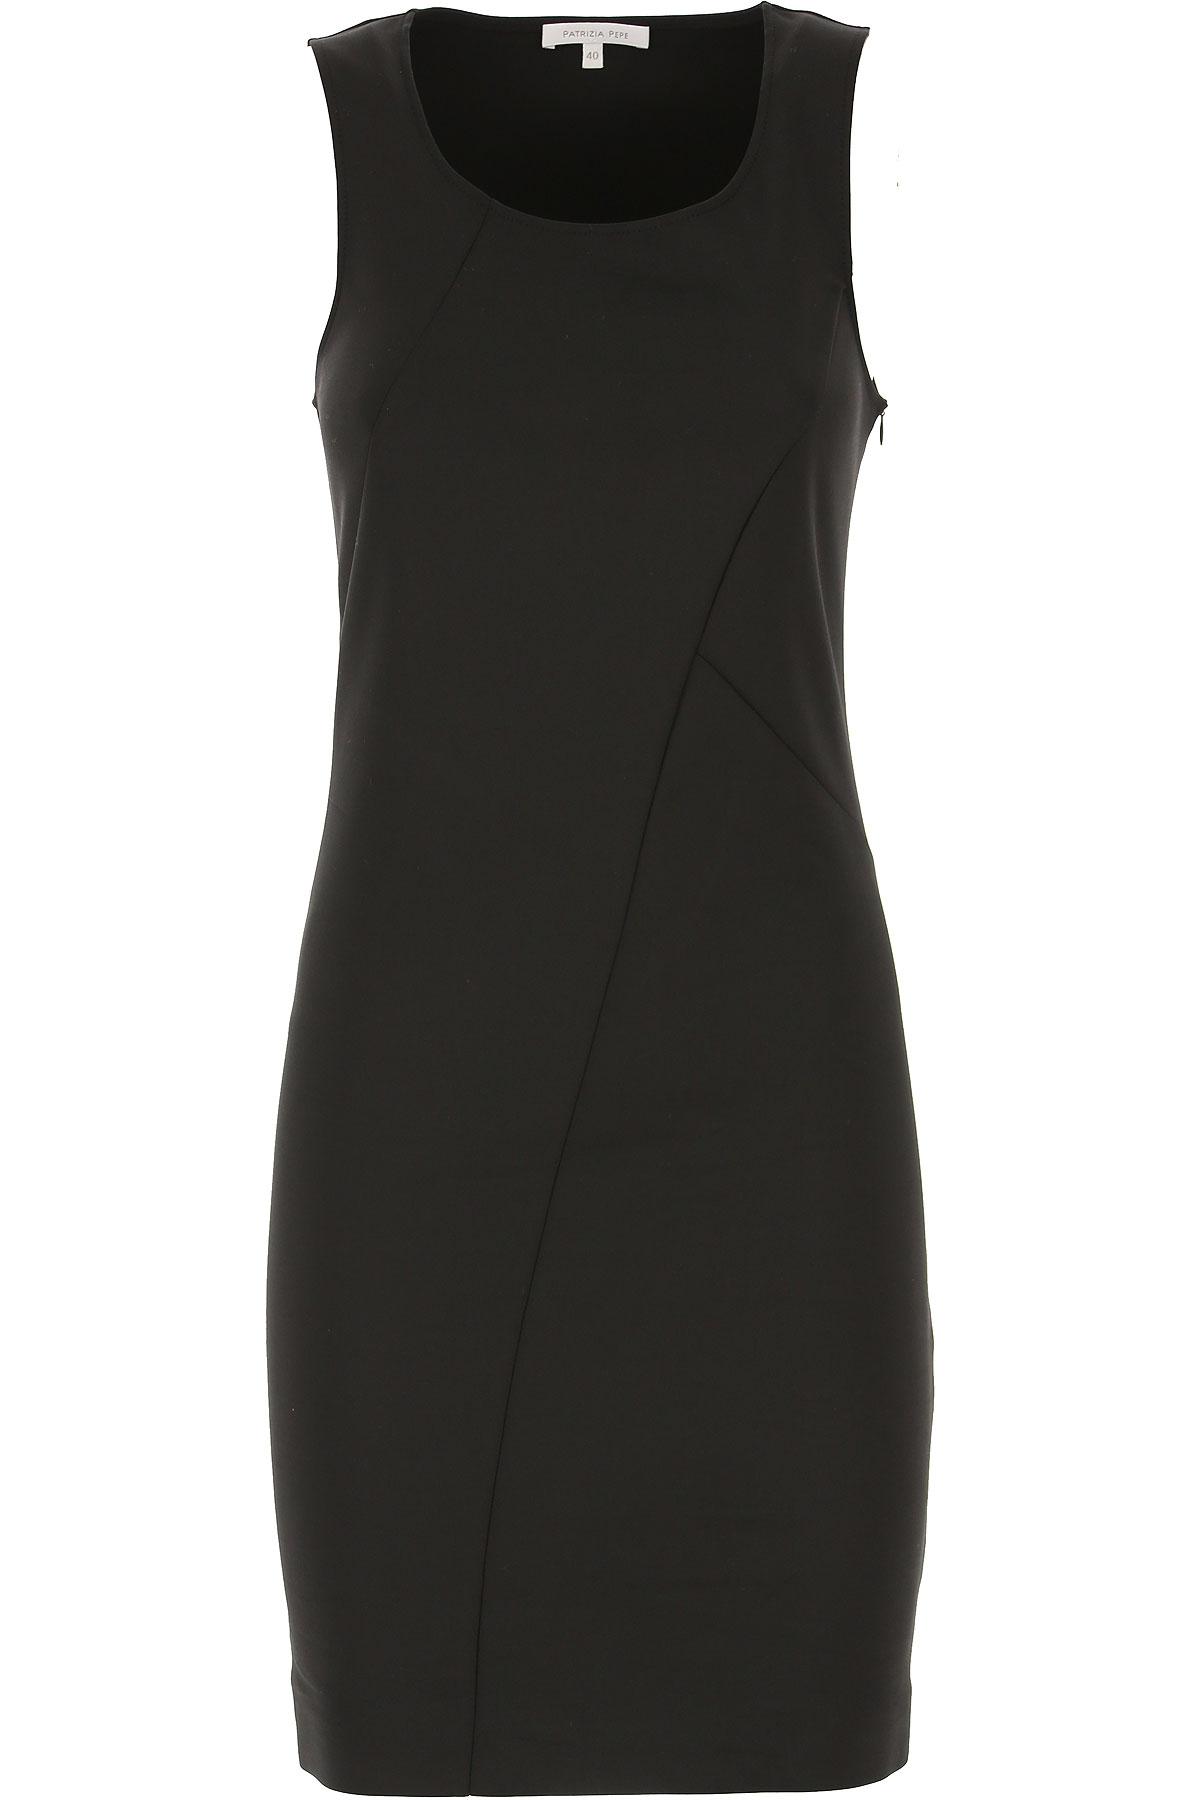 Patrizia Pepe Dress for Women, Evening Cocktail Party On Sale, Black, Cotton, 2019, 2 4 6 8